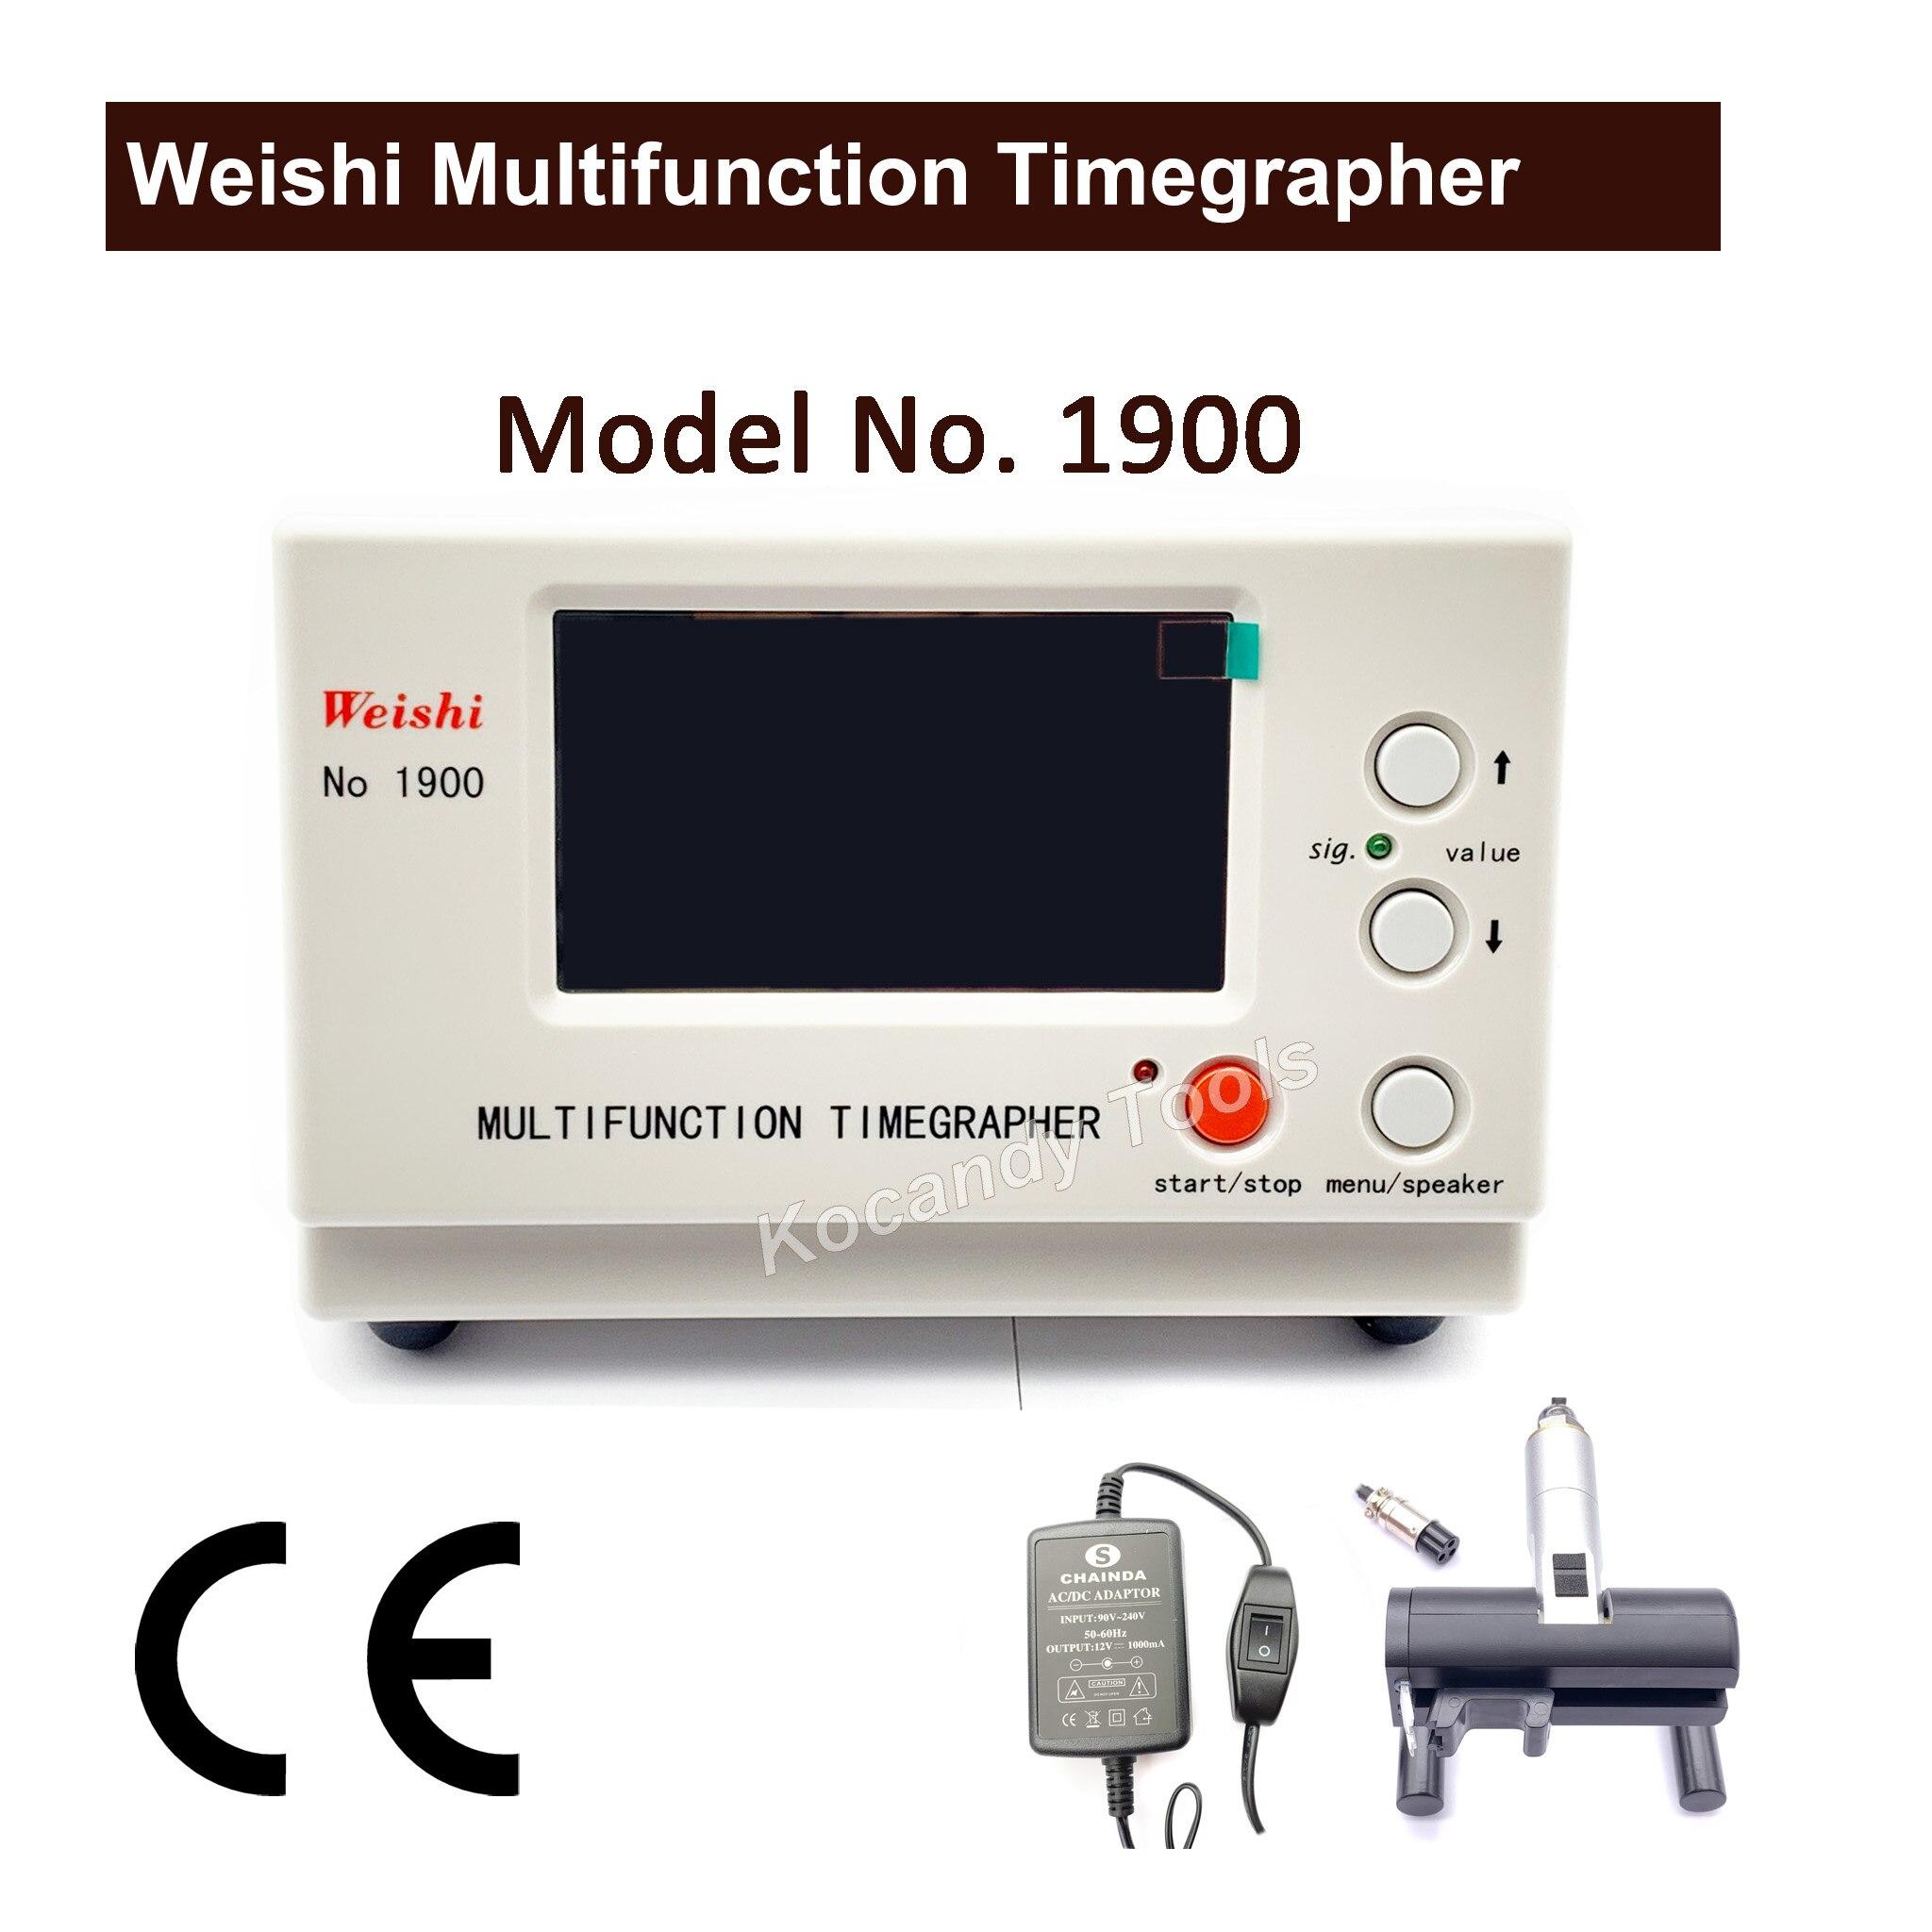 Weishi 1900 Multifunction Timegrapher, Professional Watch Timing 기계 Multifunction Timegrapher 대 한 시계 제조 Repair 툴-에서수리 도구 & 키트부터 시계 의  그룹 1